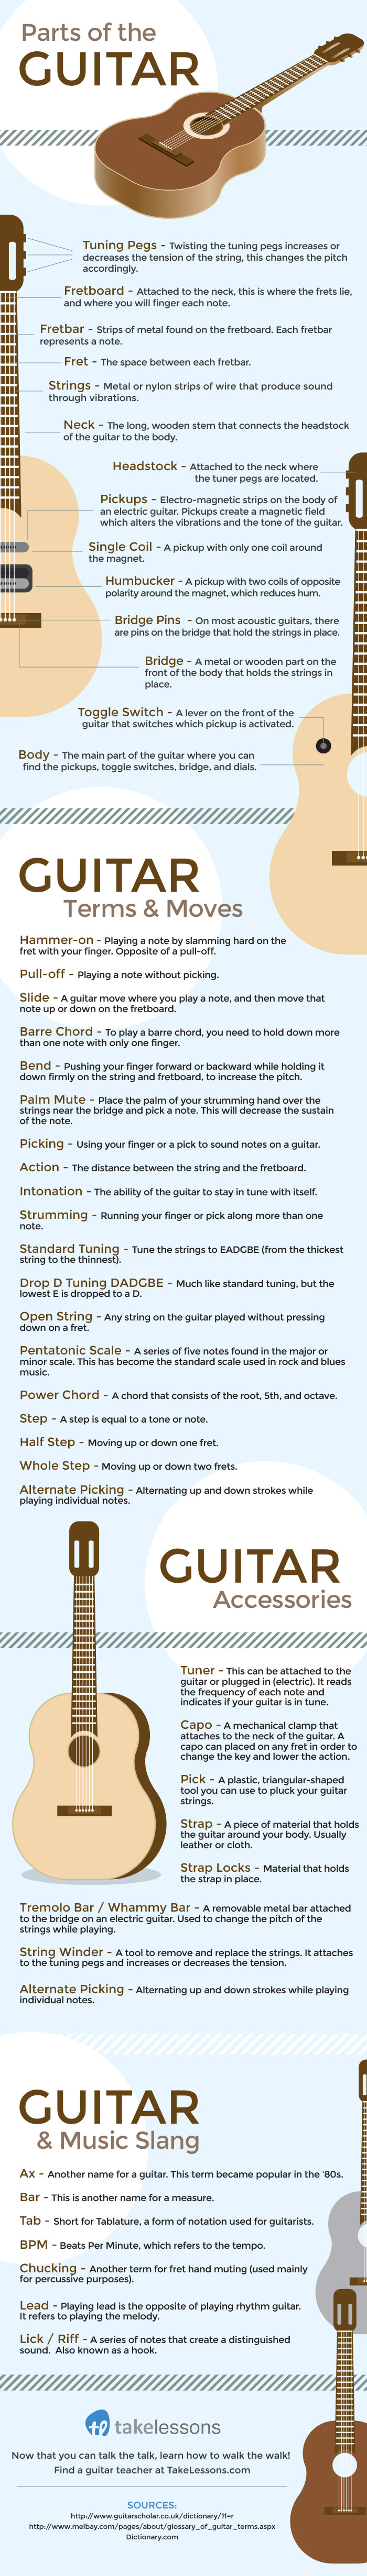 easy guitar terms